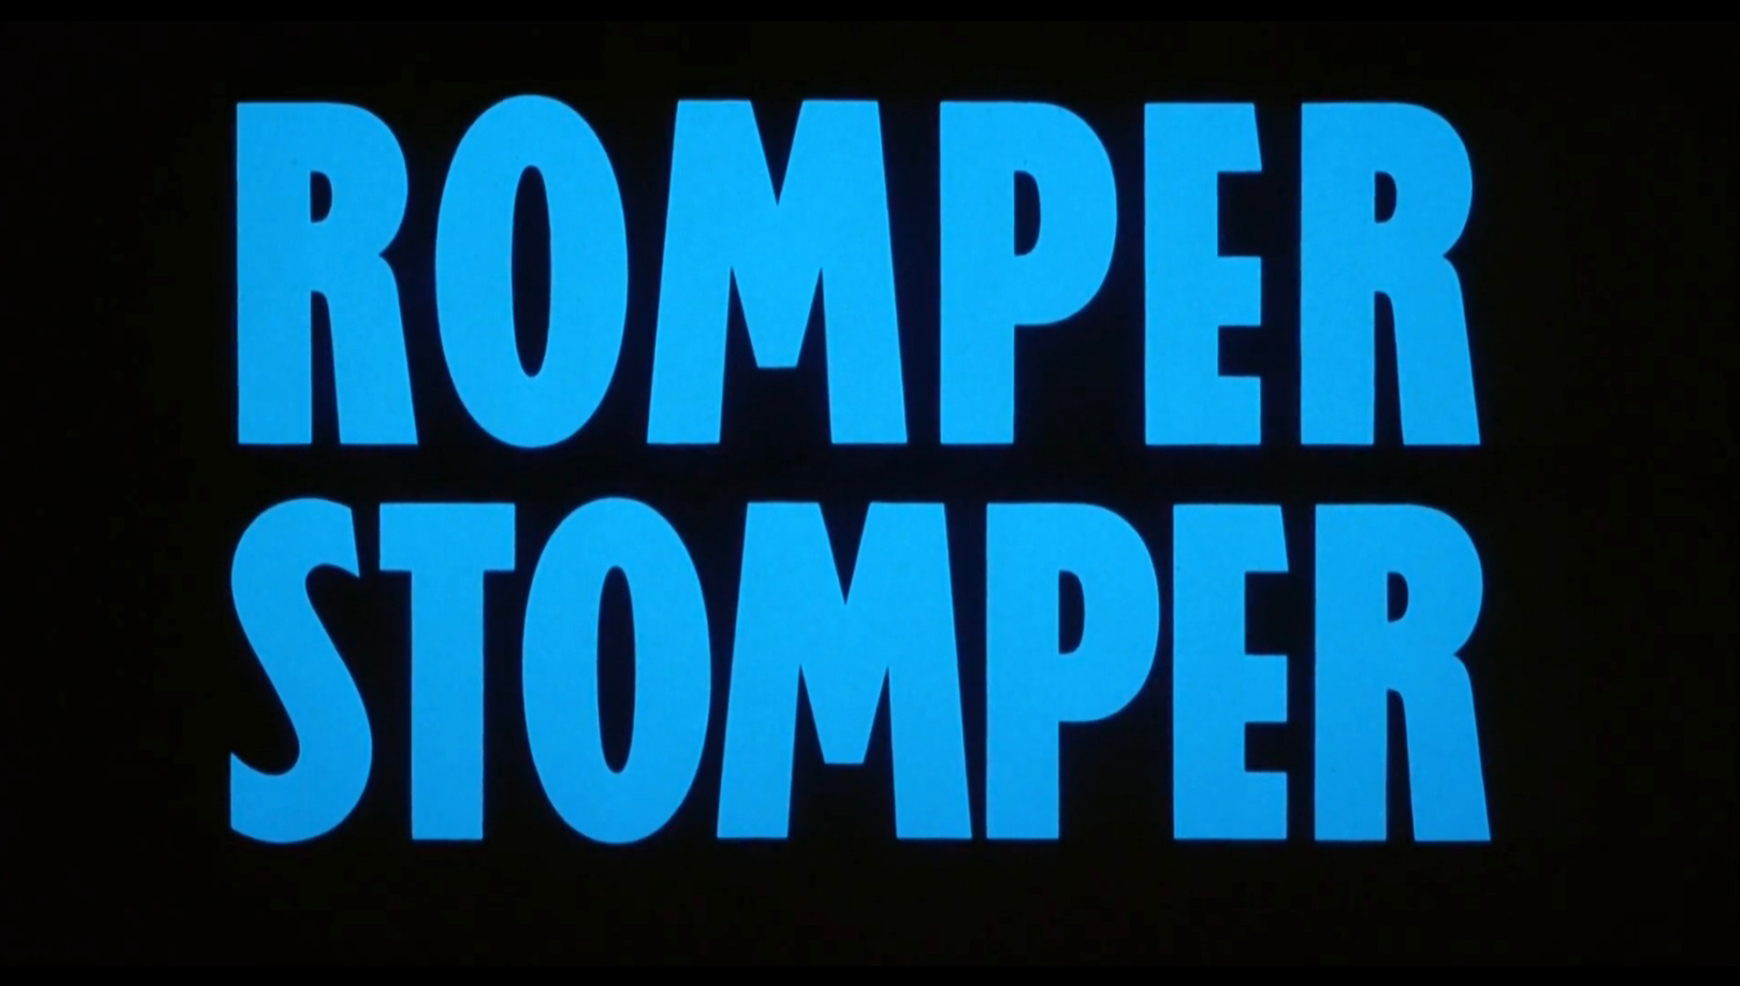 f4b271077f4a Romper Stomper - Review - Photos - Ozmovies